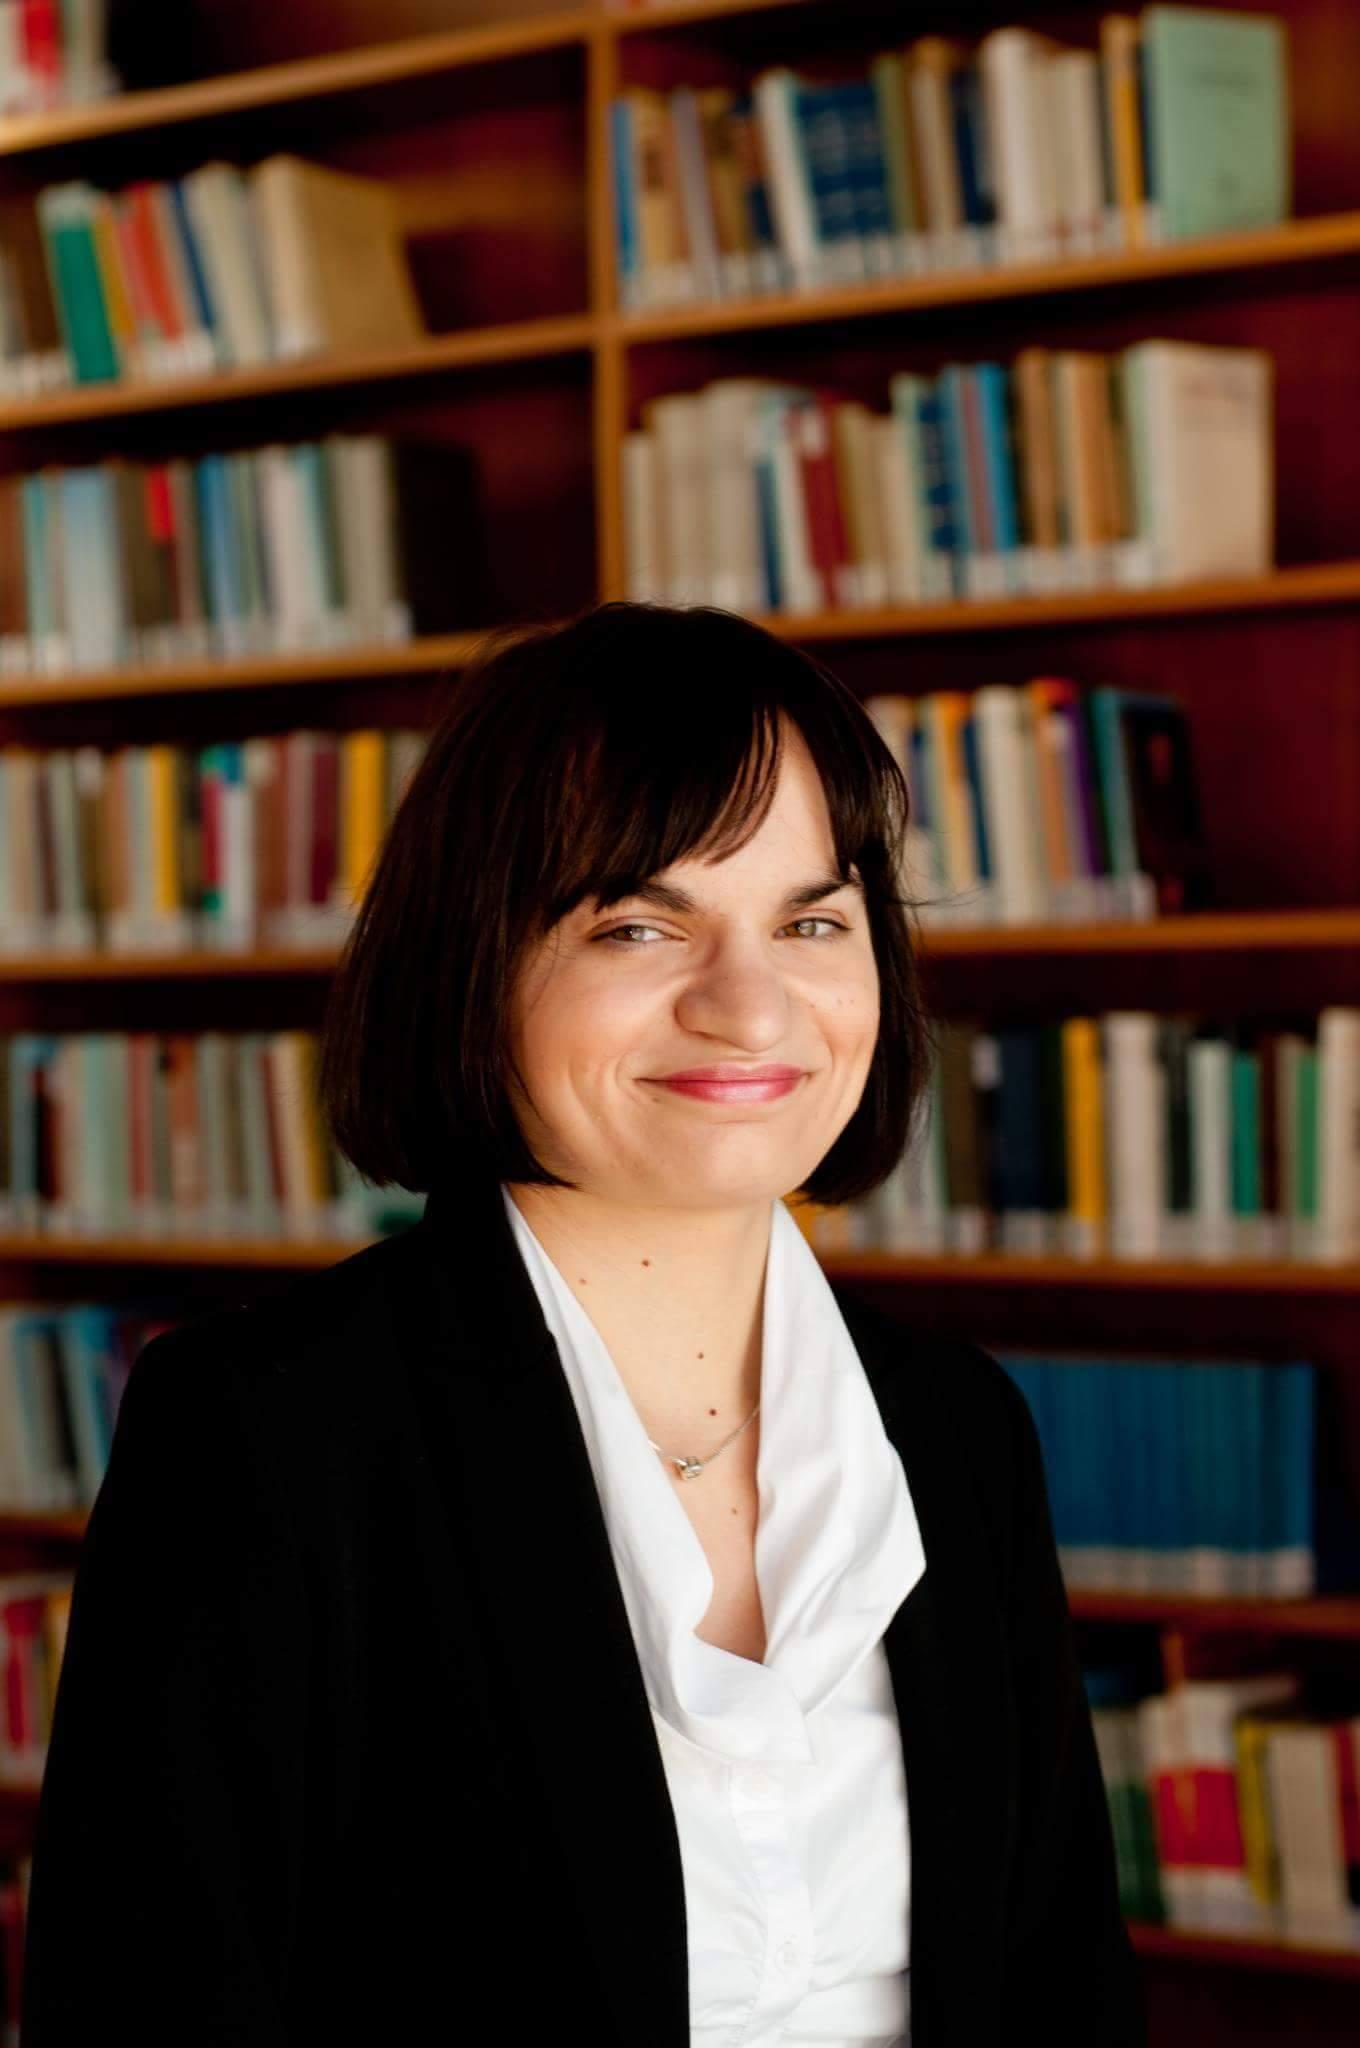 Autoreninterview – Sonja Marschke